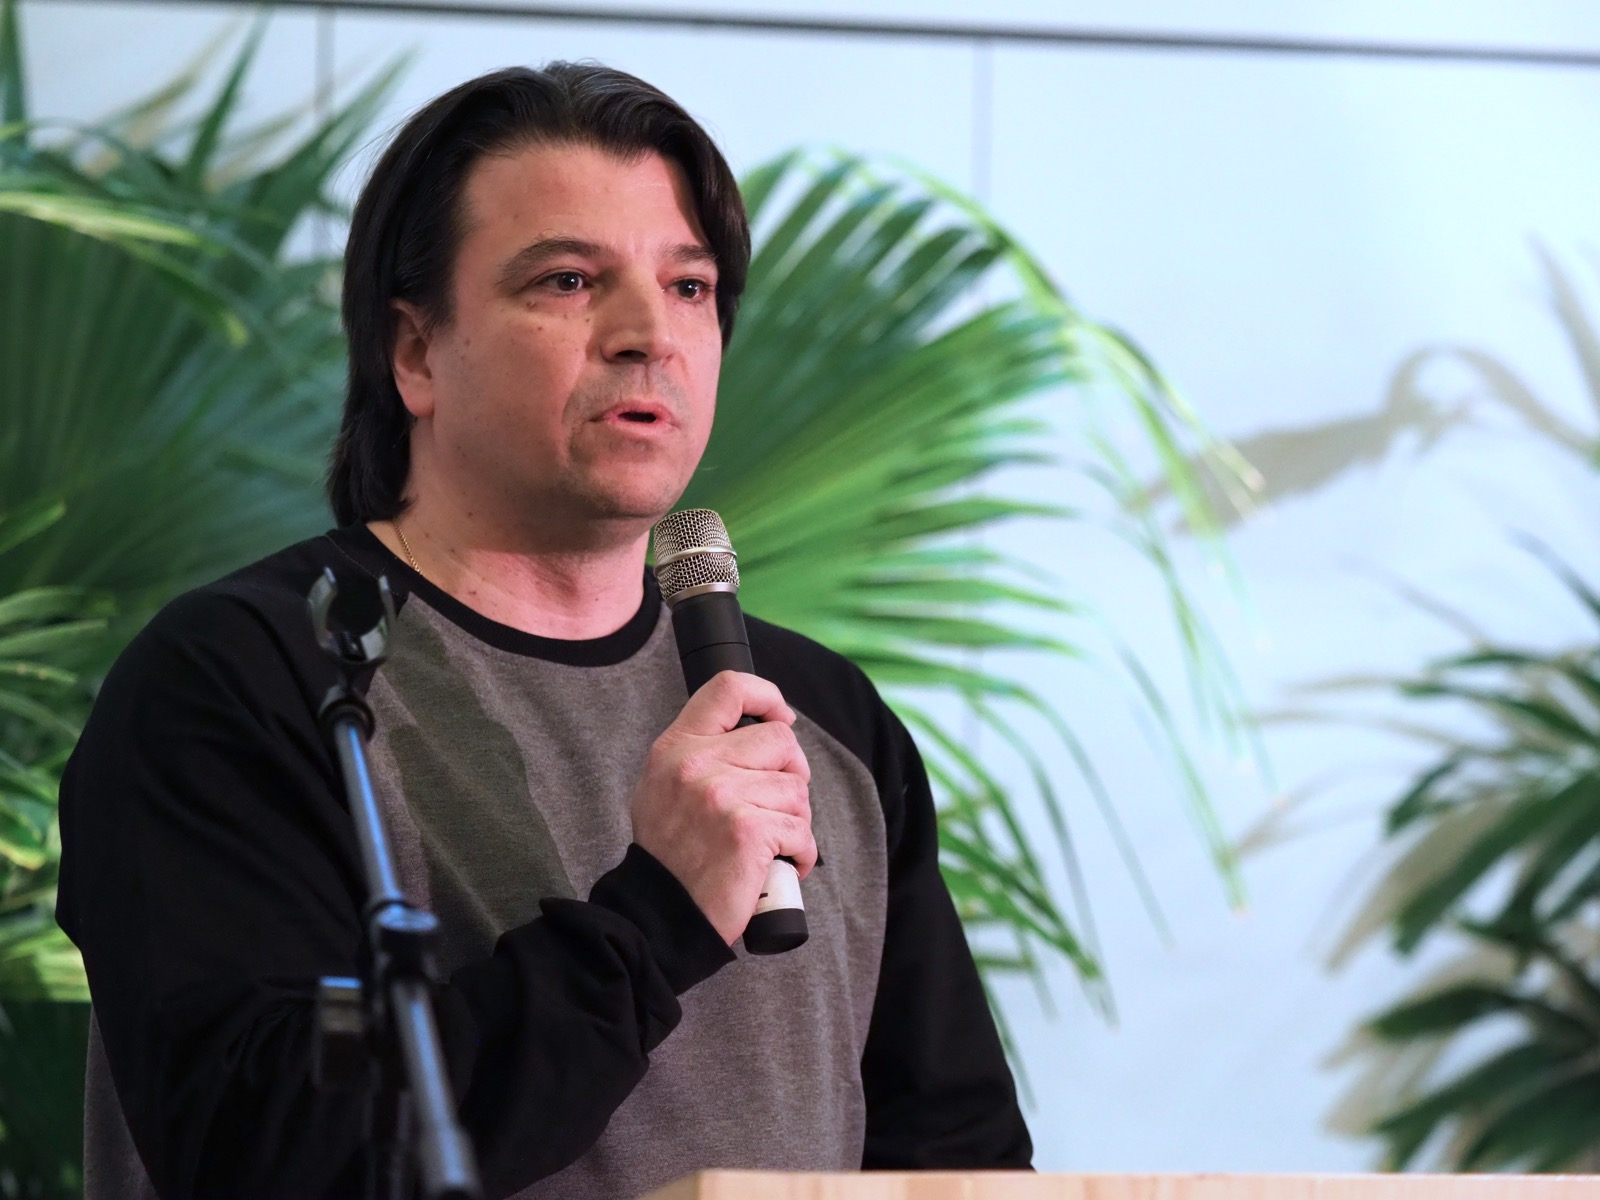 Shopify Director of Engineering Stergios Anastasiadis